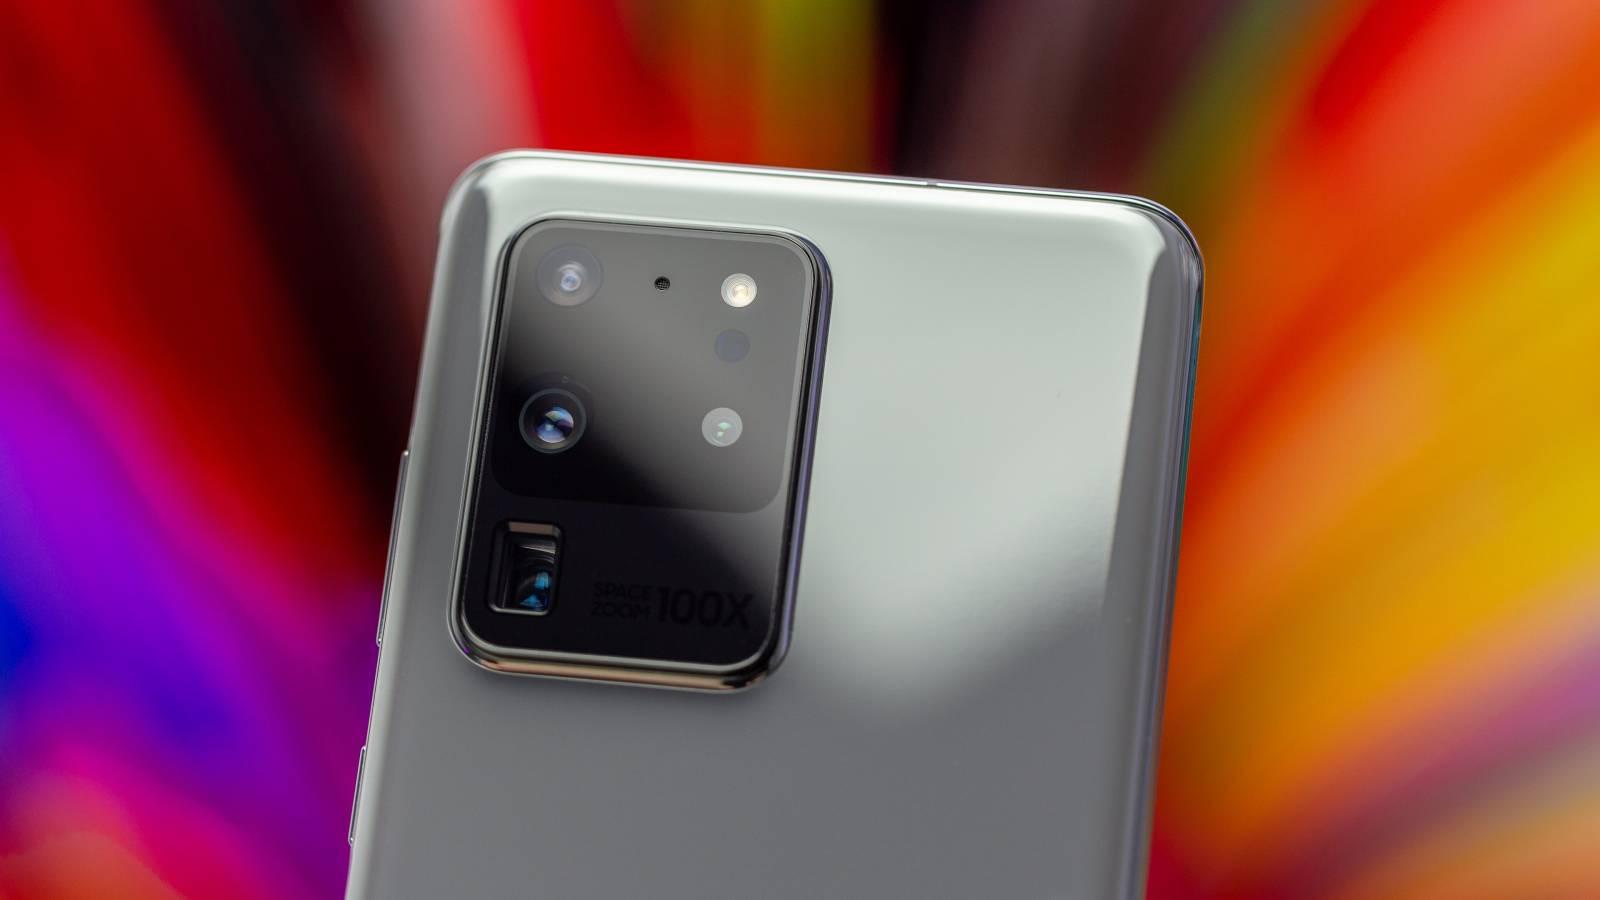 eMAG Samsung GALAXY S20 REDUCERI Revolutia Preturilor